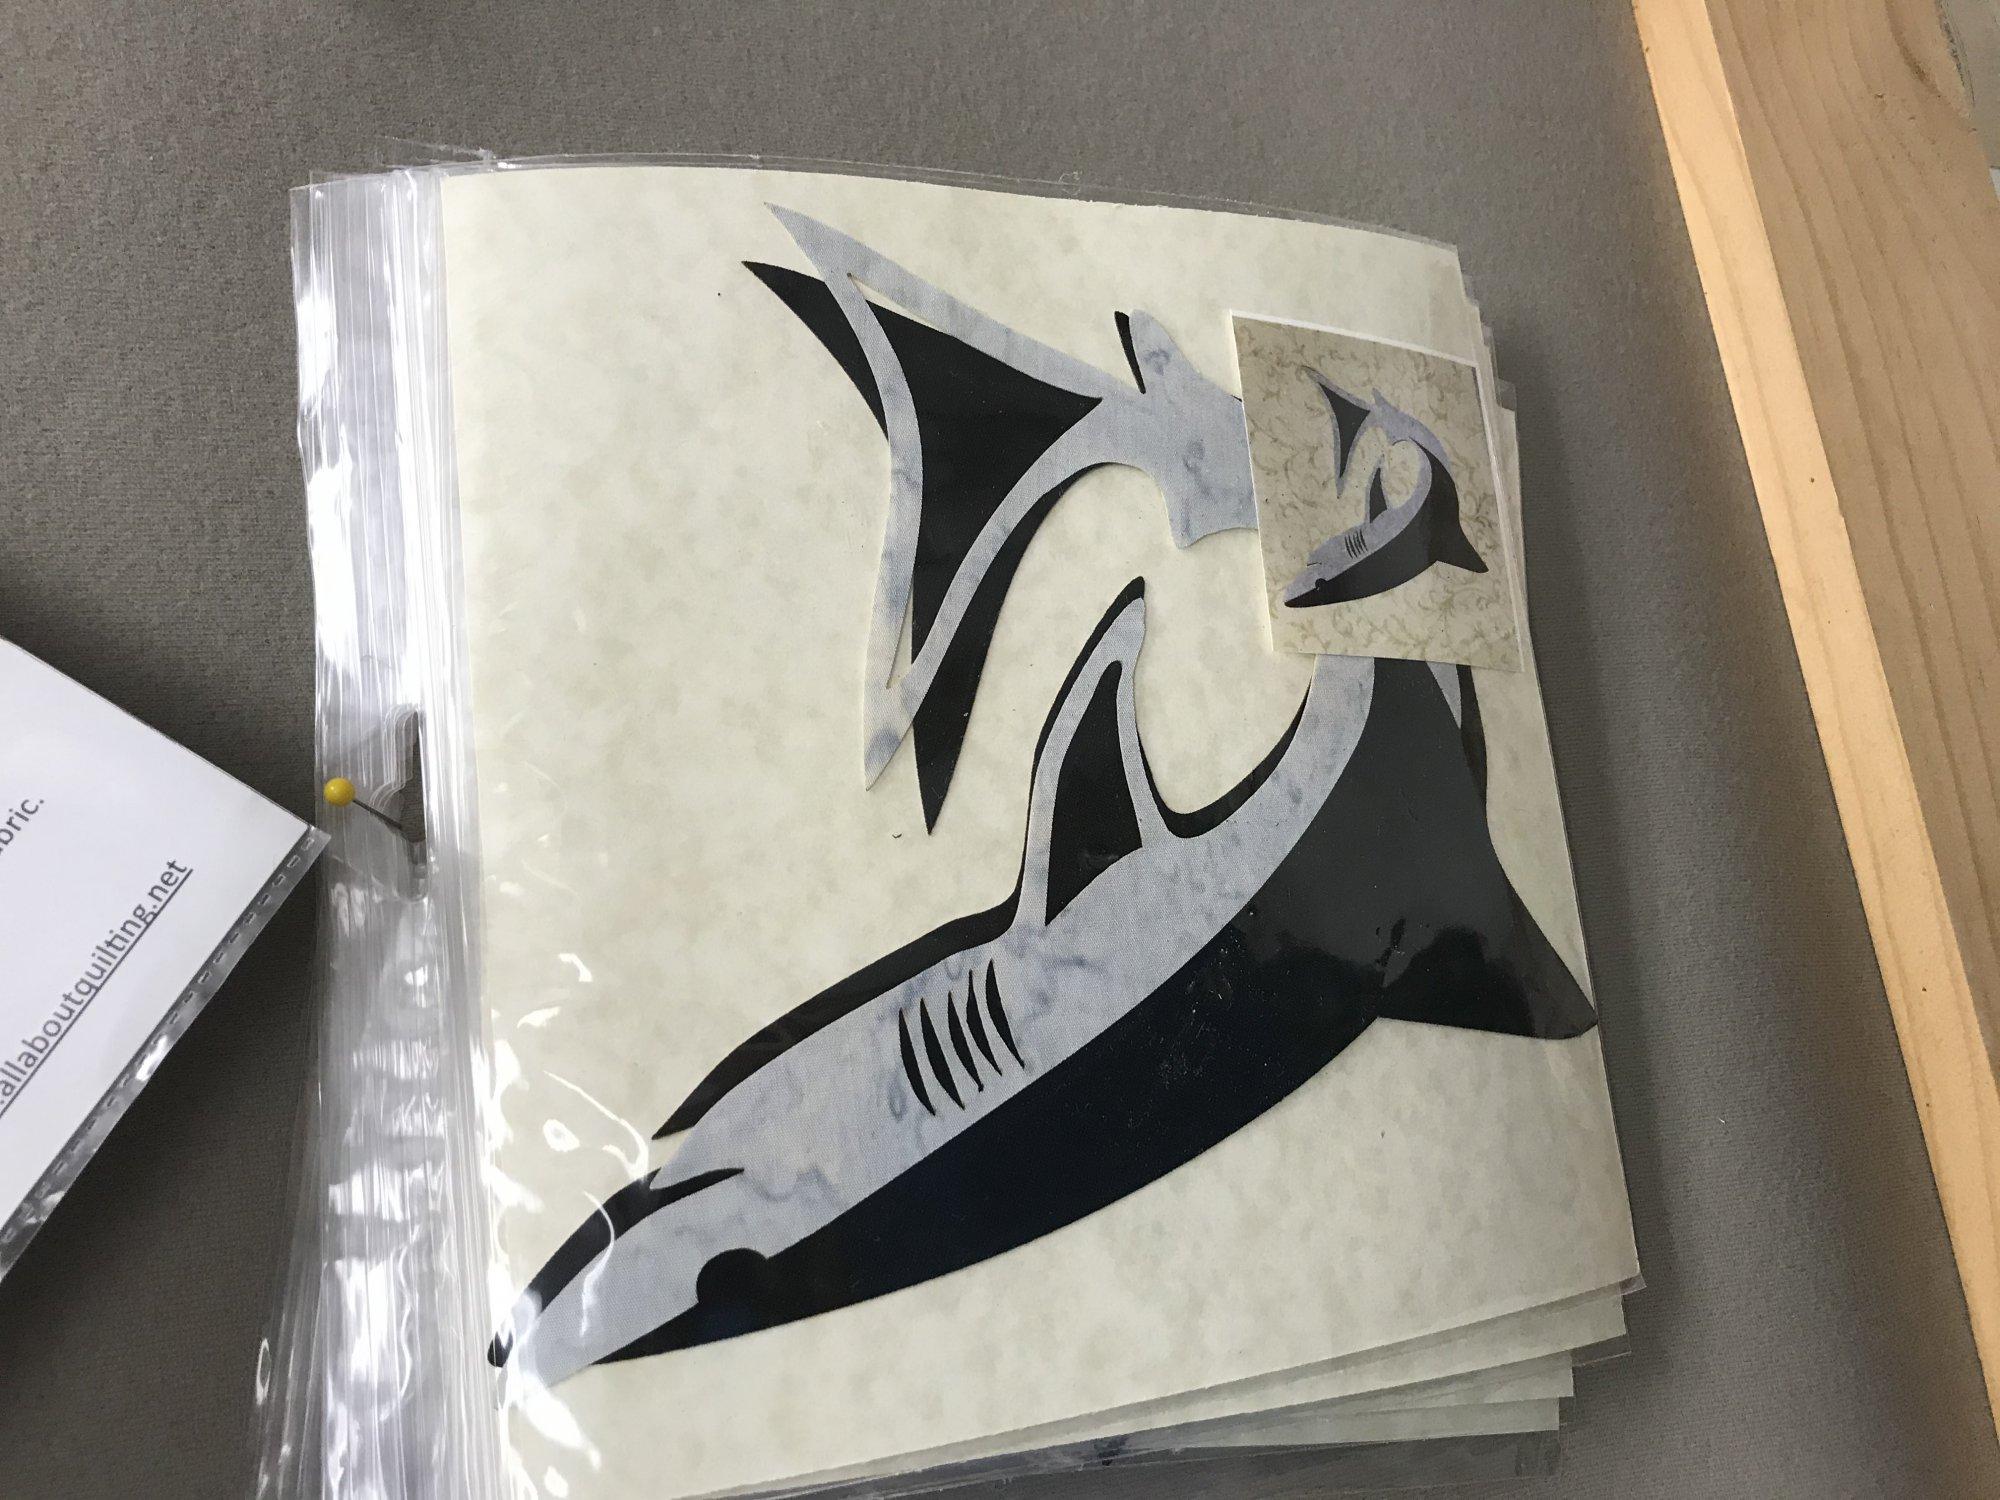 Applique Designs - Laser Cut and Pre Fused - SHARK